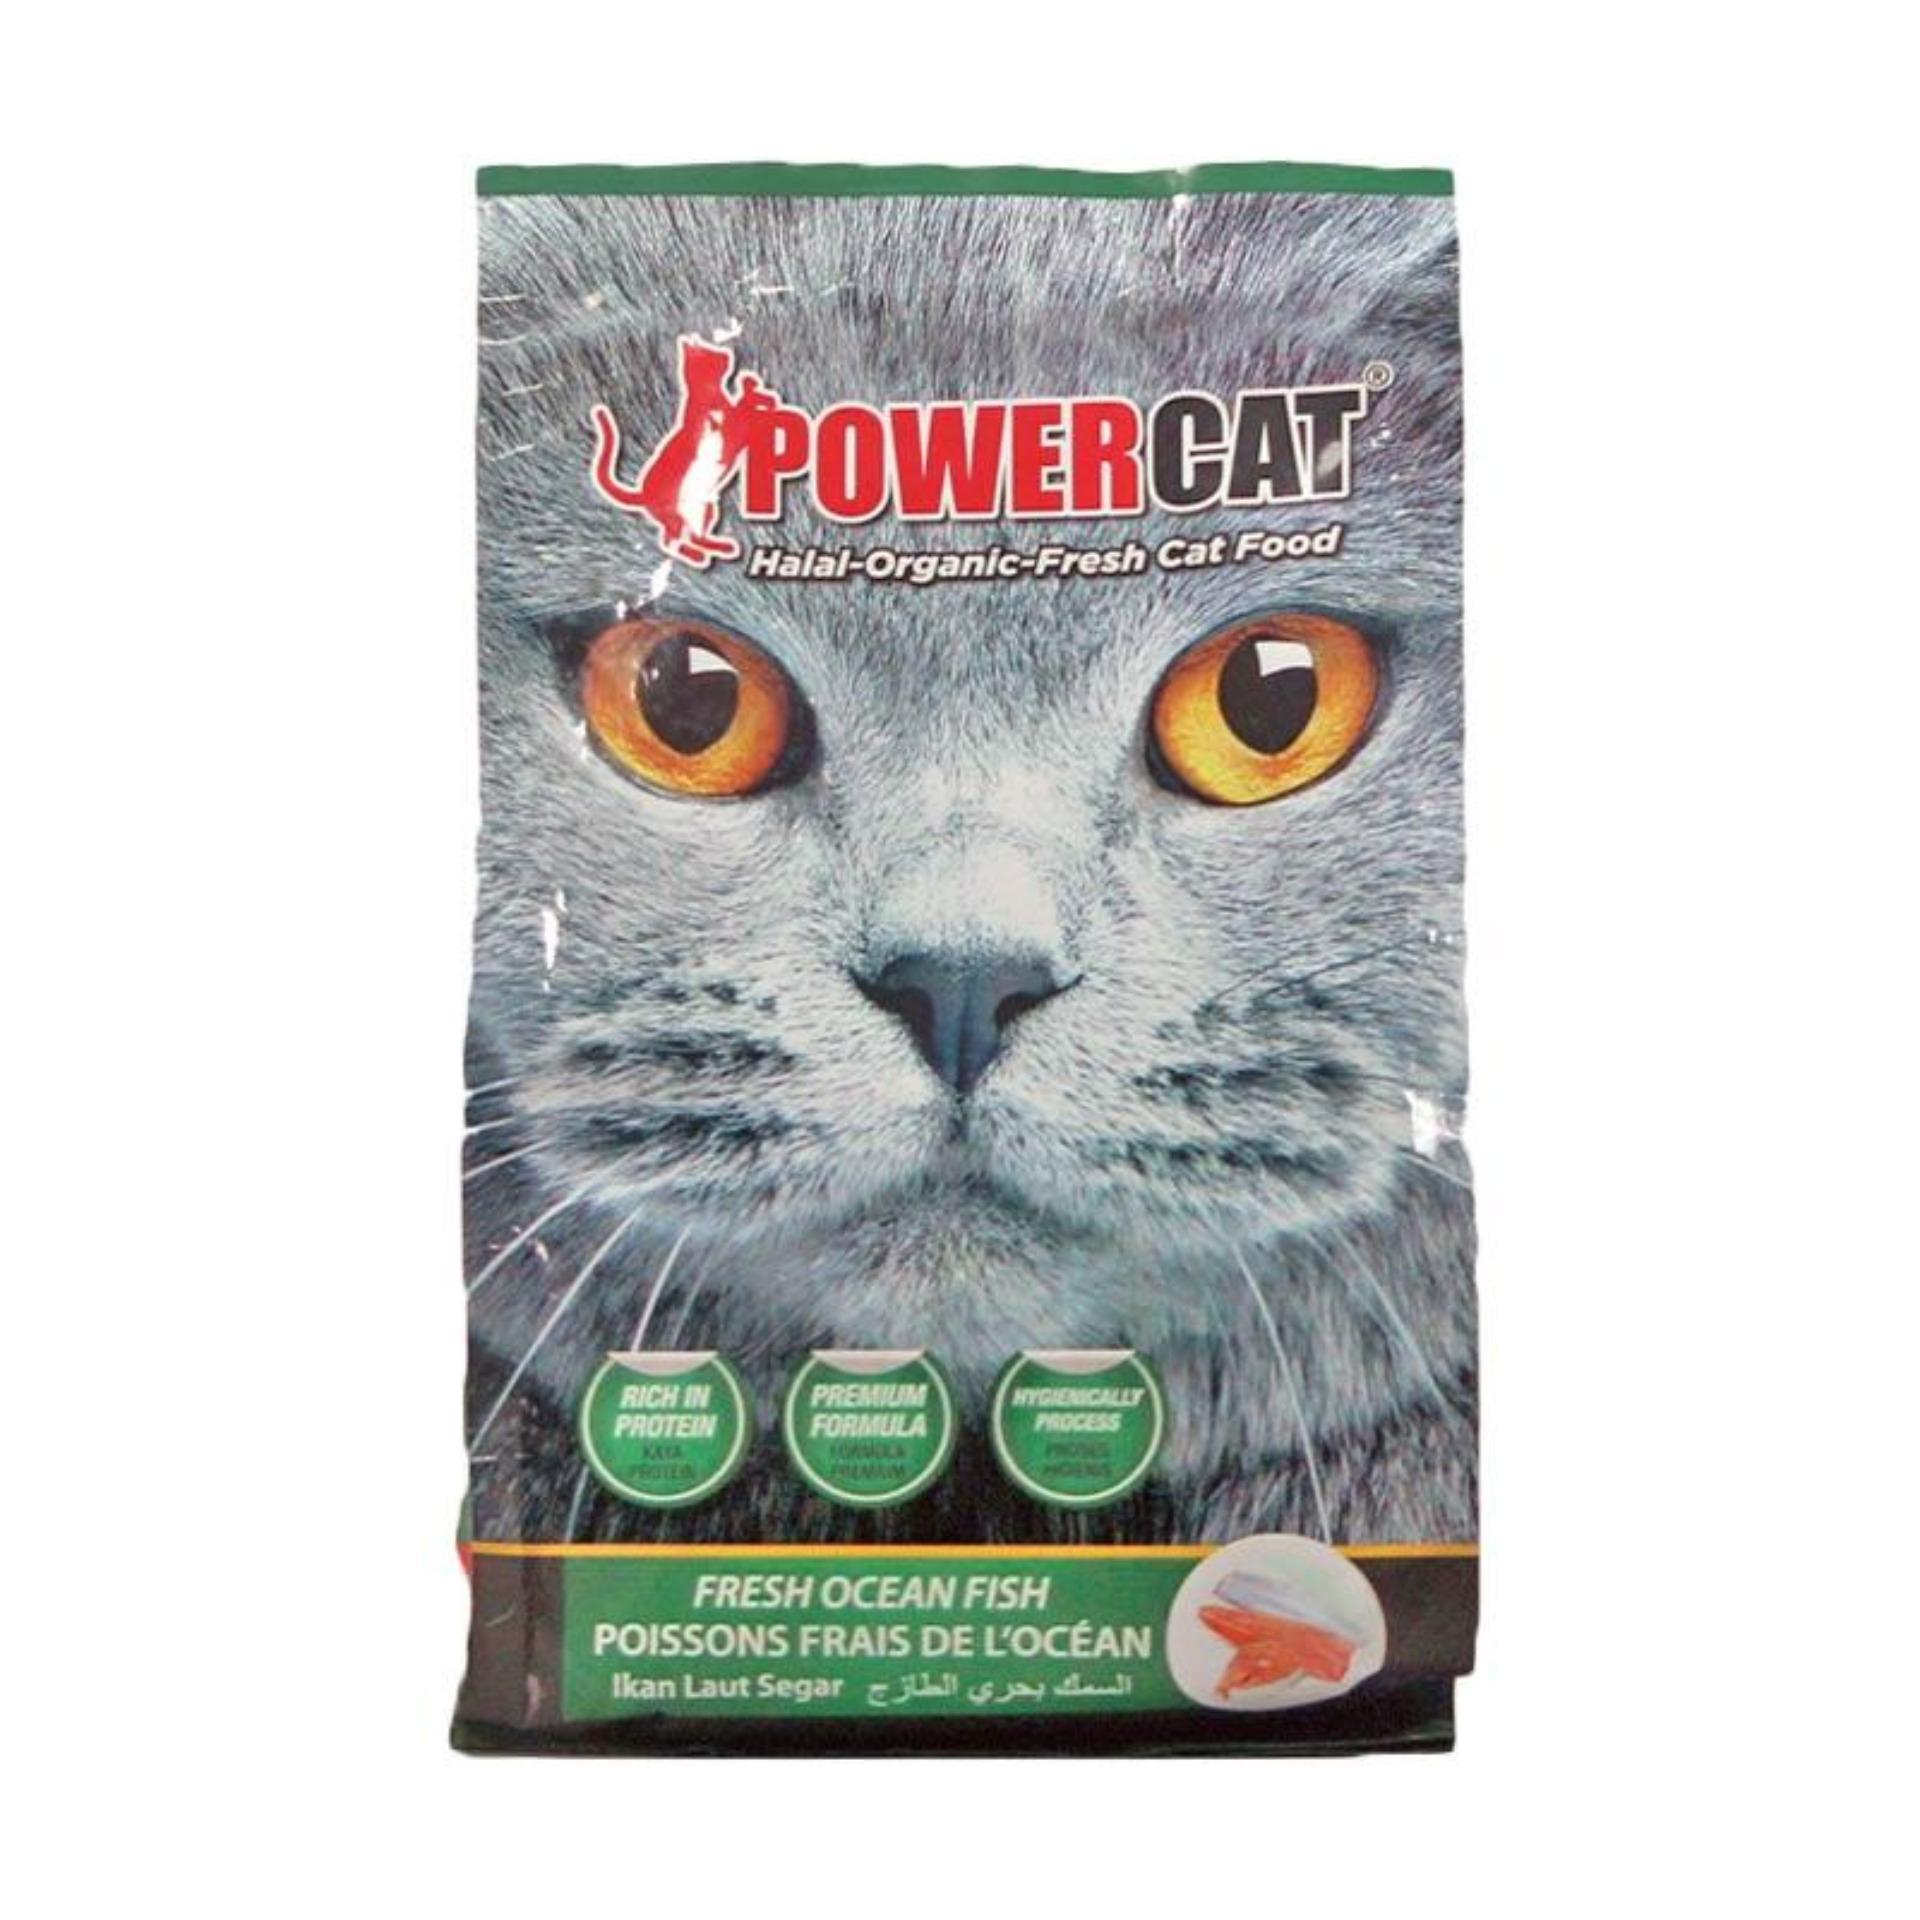 ... Powercat Dry Fresh Ocean Fish Cat Food 500g ...